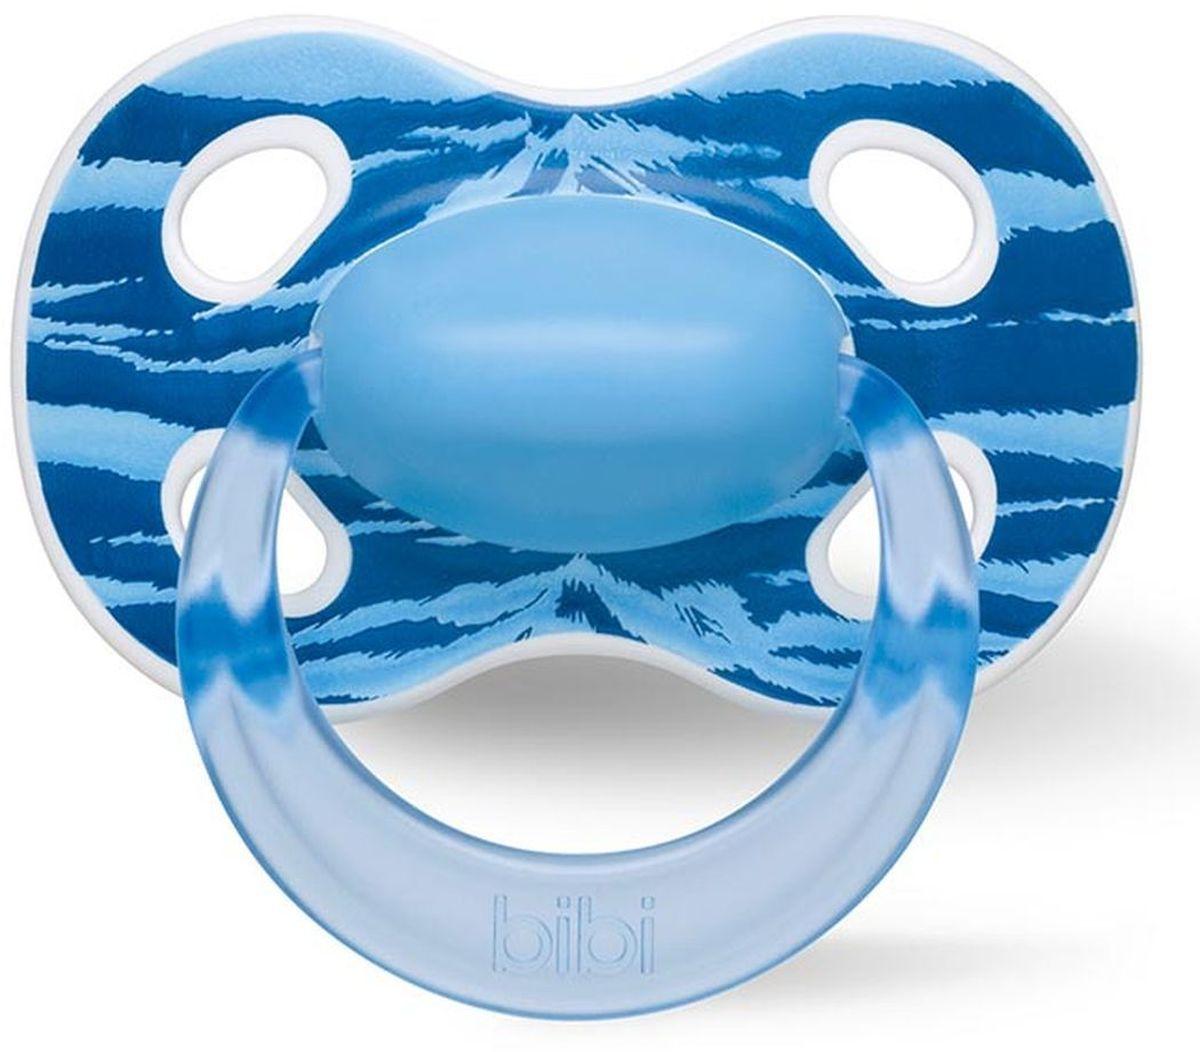 Bibi Пустышка силиконовая Happiness Ring Wild Baby от 0 до 6 месяцев114060